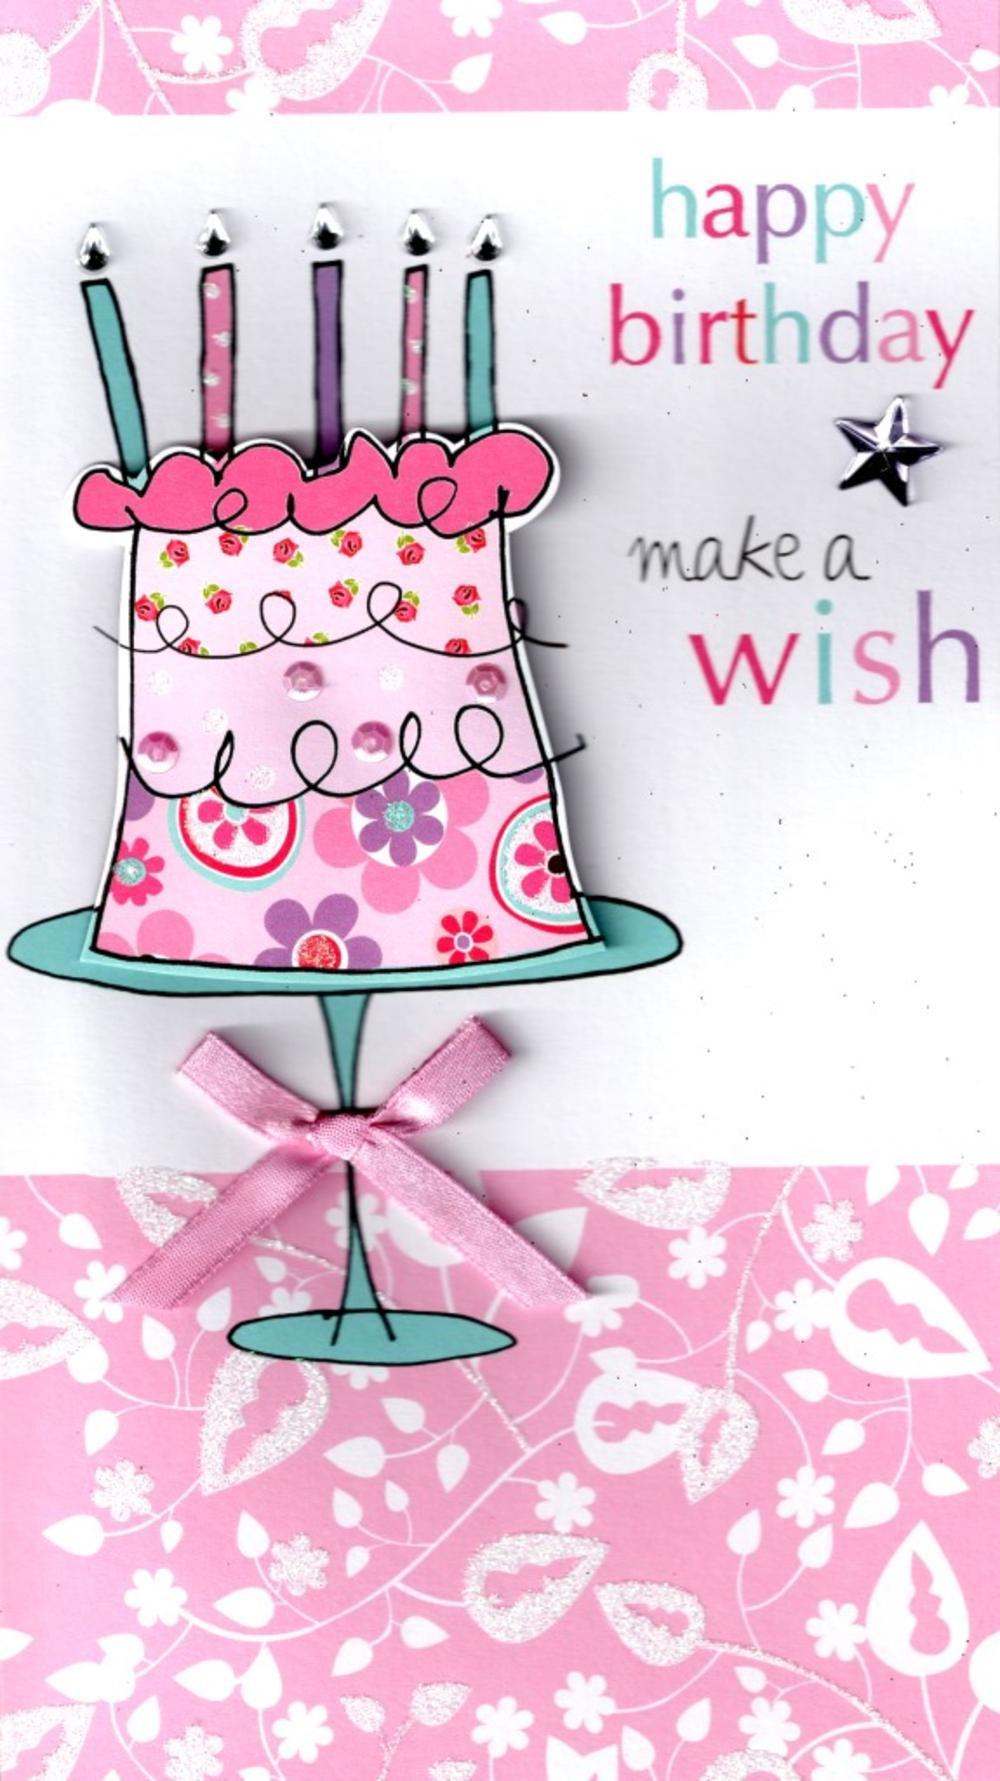 Make A Birthday Card Online  Make A Wish Happy Birthday Greeting Card Cards